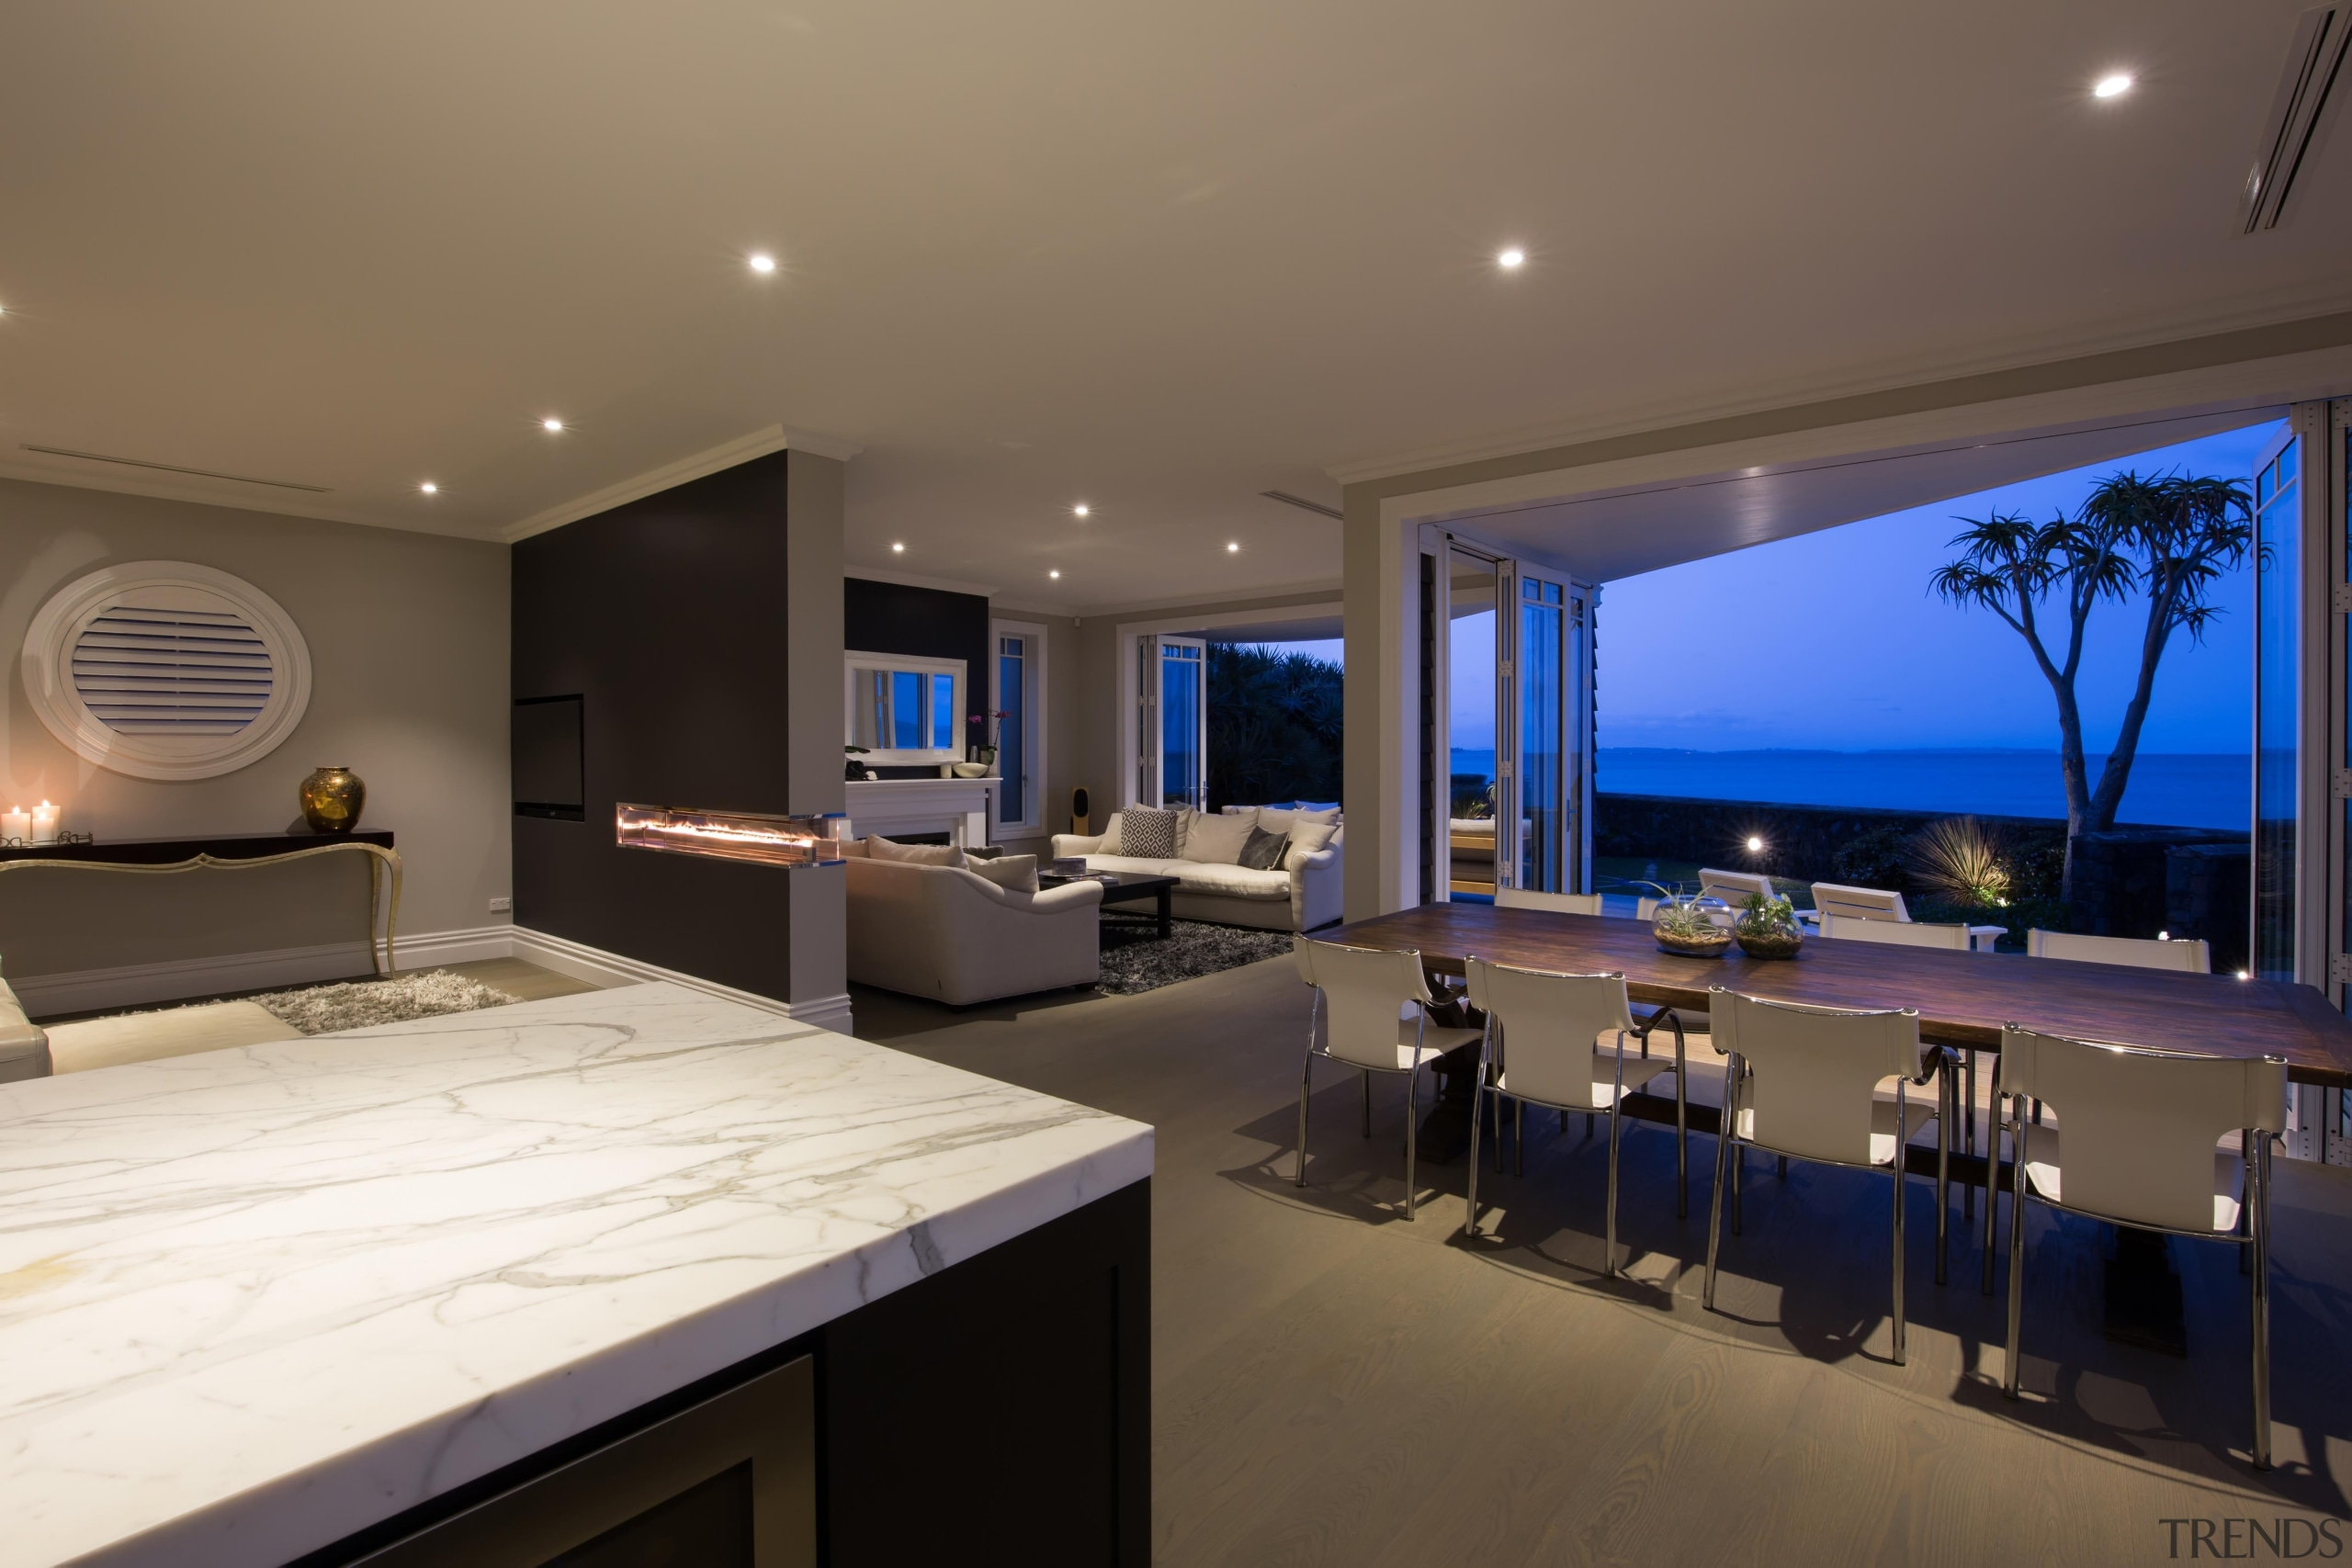 img9005 - apartment   interior design   lighting apartment, interior design, lighting, penthouse apartment, property, real estate, brown